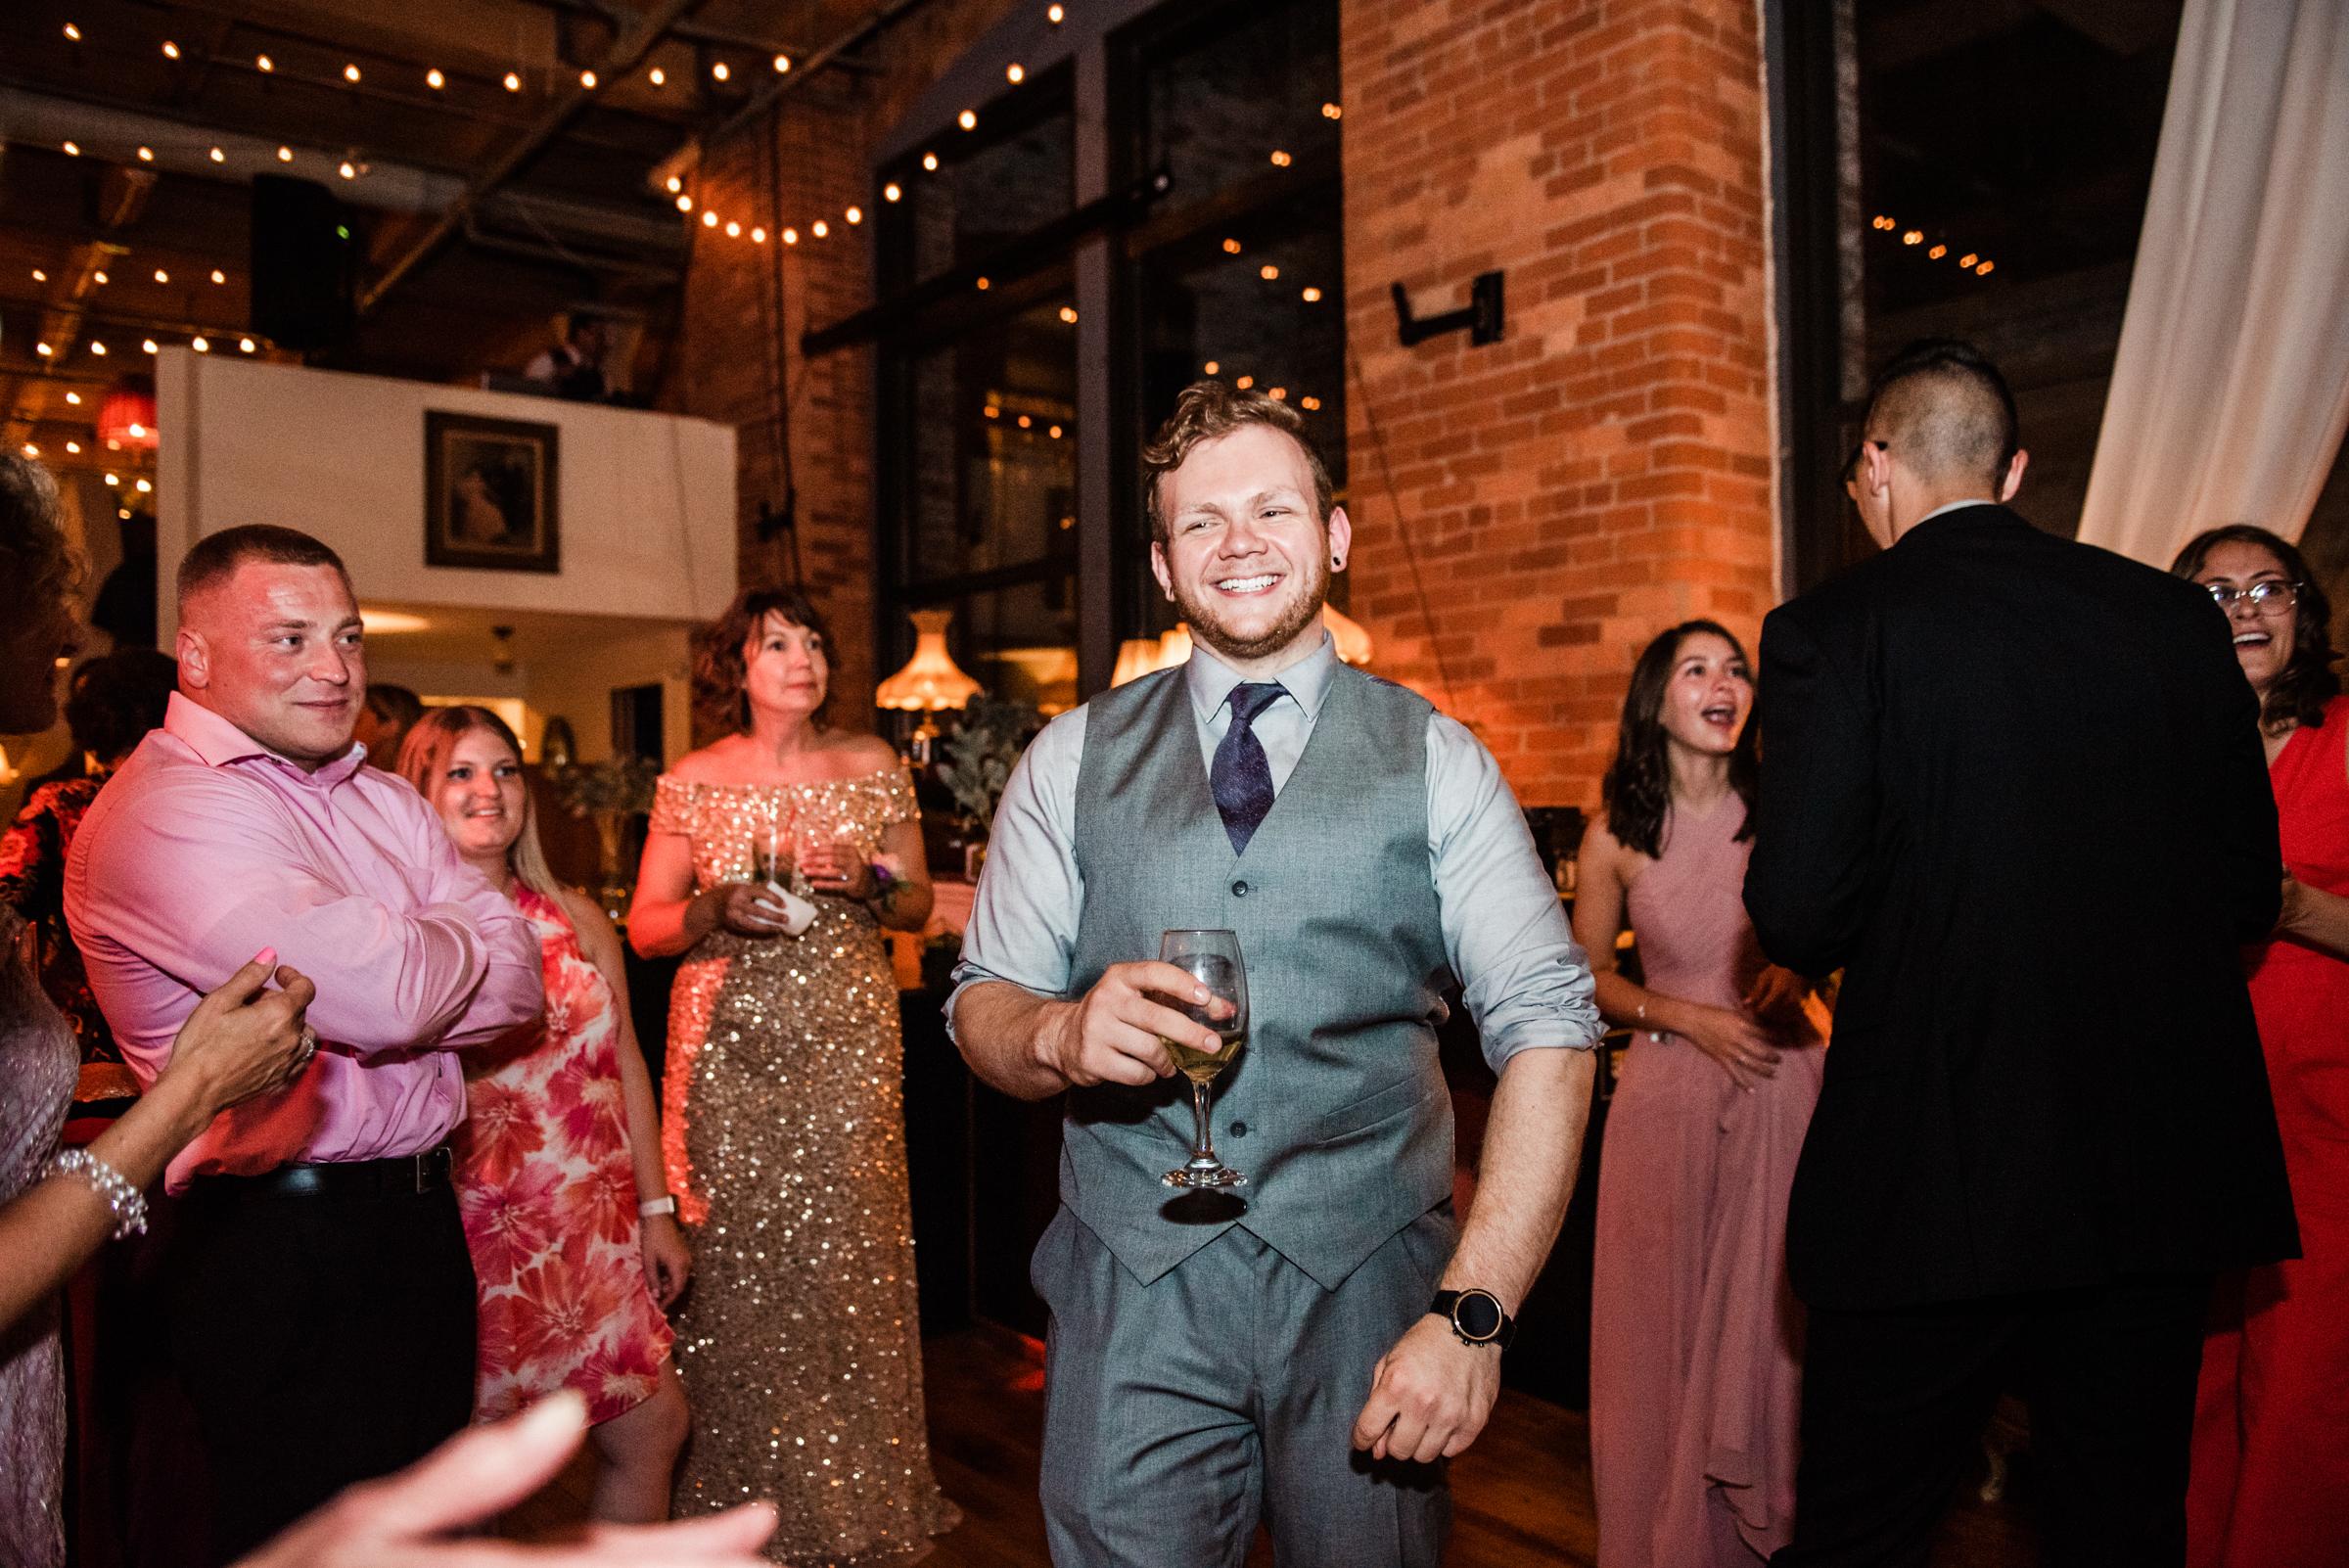 Studio_180_Lamberton_Conservatory_Rochester_Wedding_JILL_STUDIO_Rochester_NY_Photographer_DSC_9485.jpg